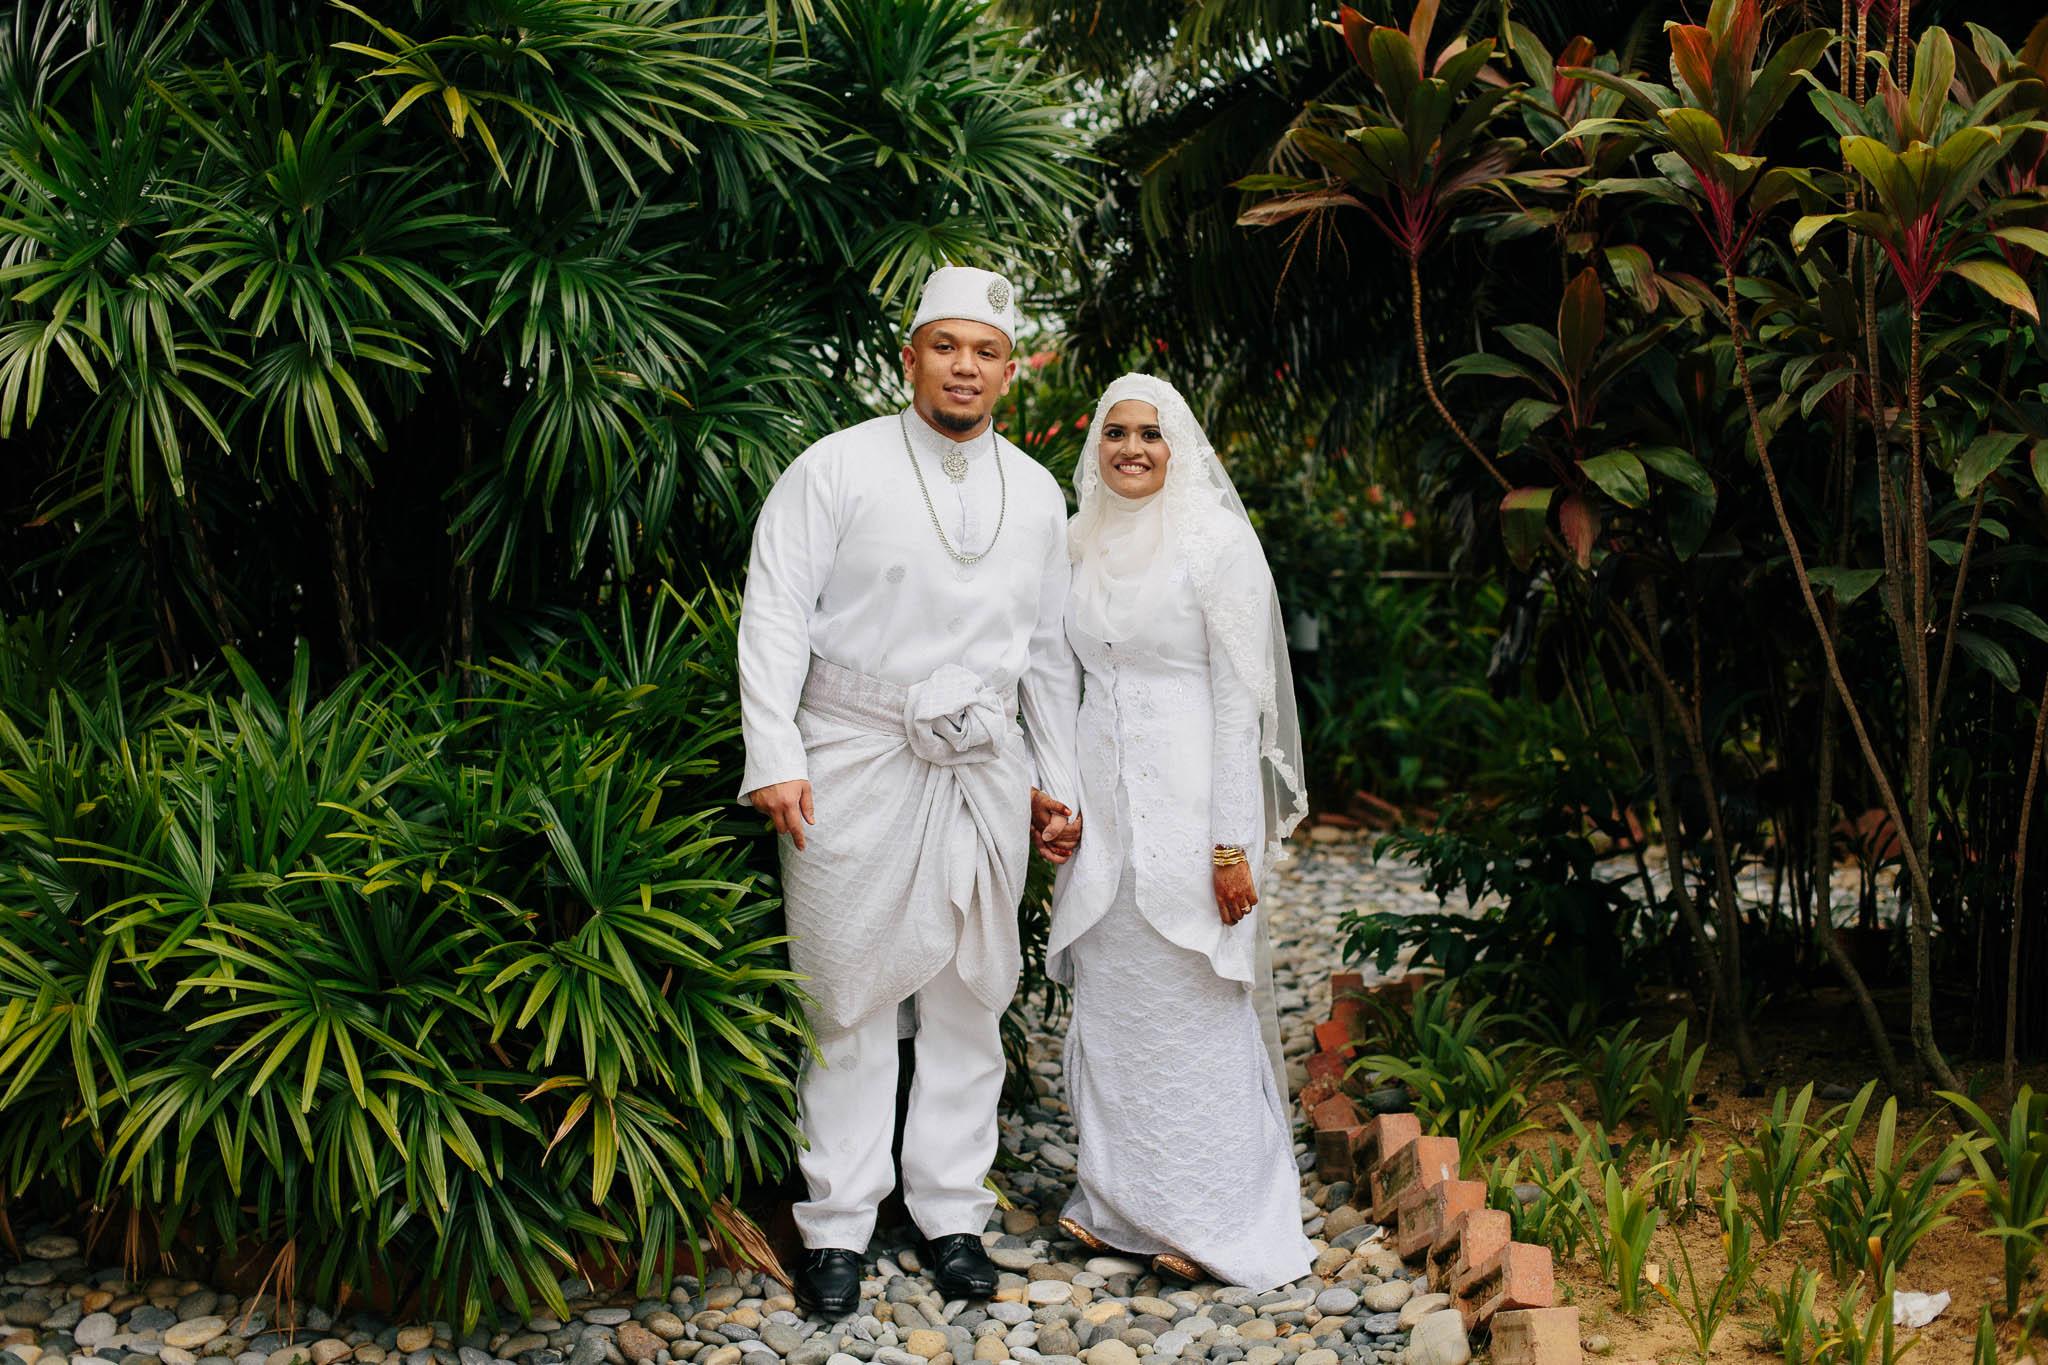 singapore-wedding-photographer-malay-indian-pre-wedding-travel-wmt-2015-29.jpg